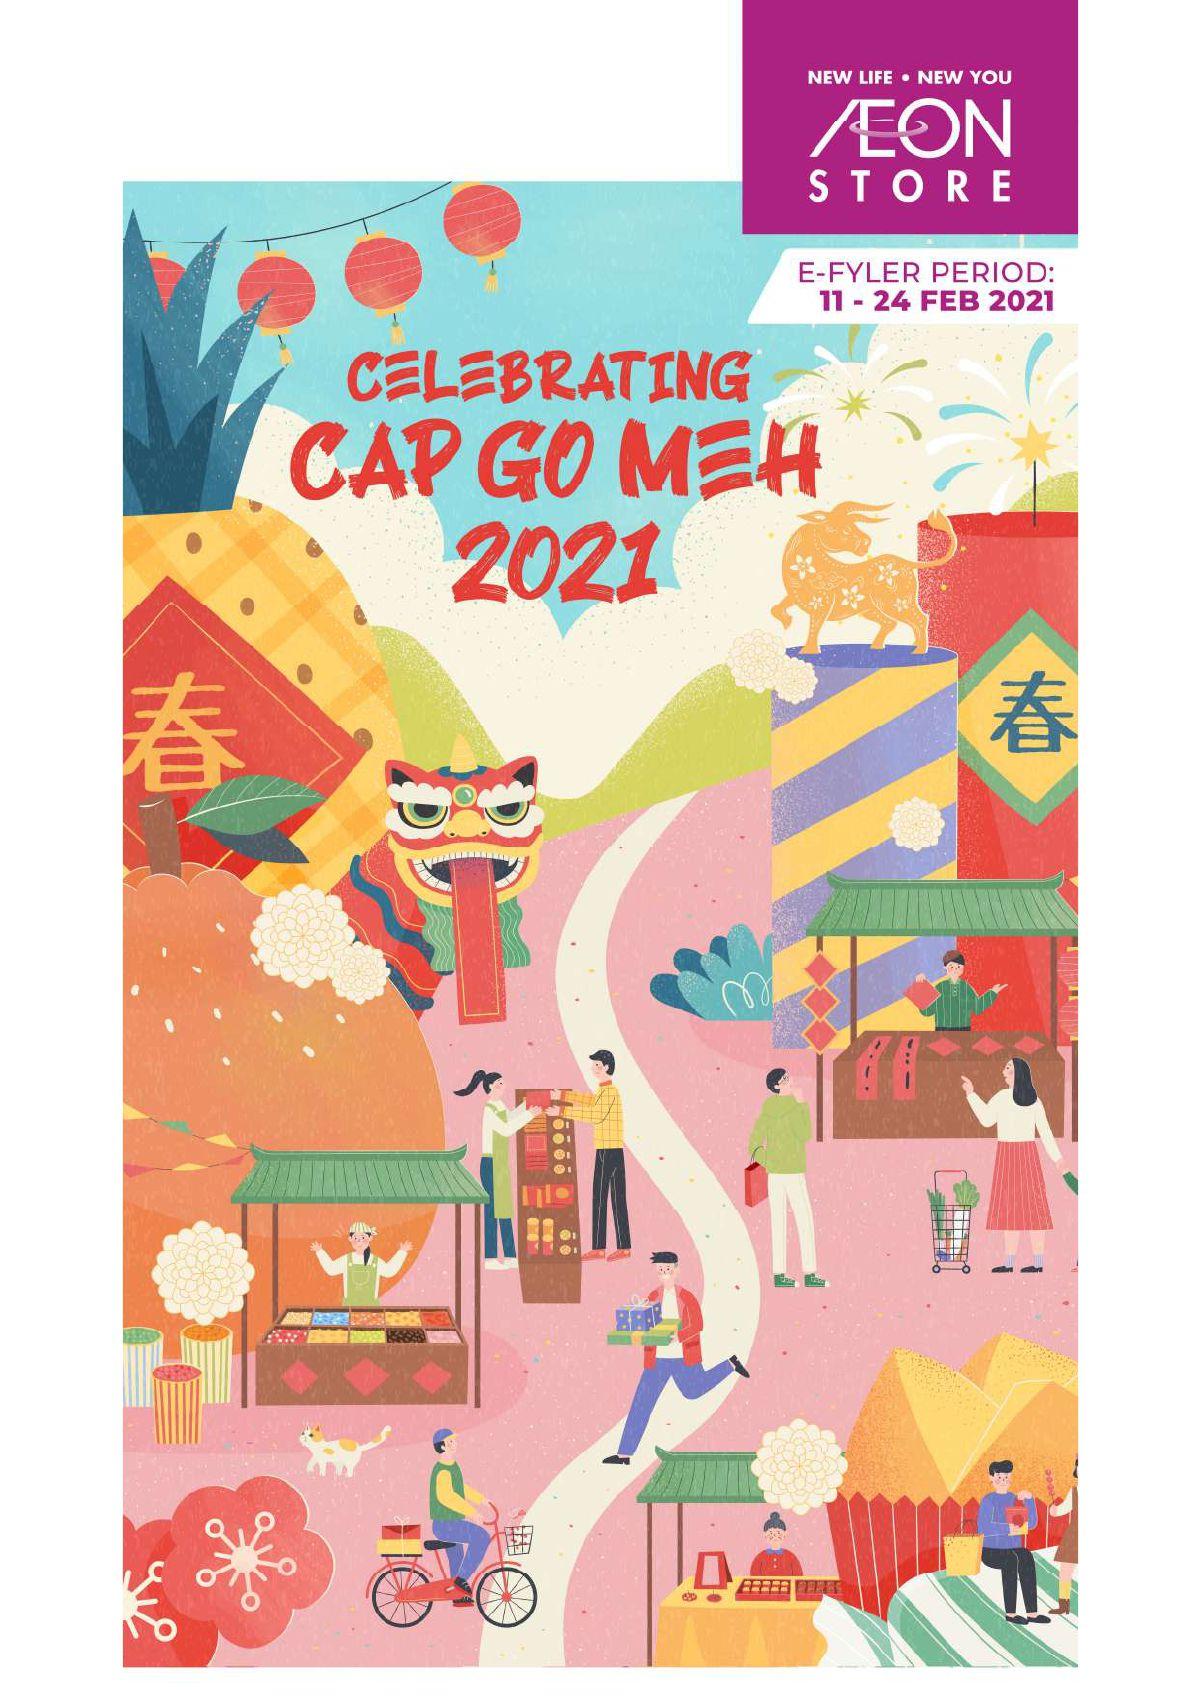 Katalog Promo Aeon Store Indonesia periode 11-24 Februari 2021